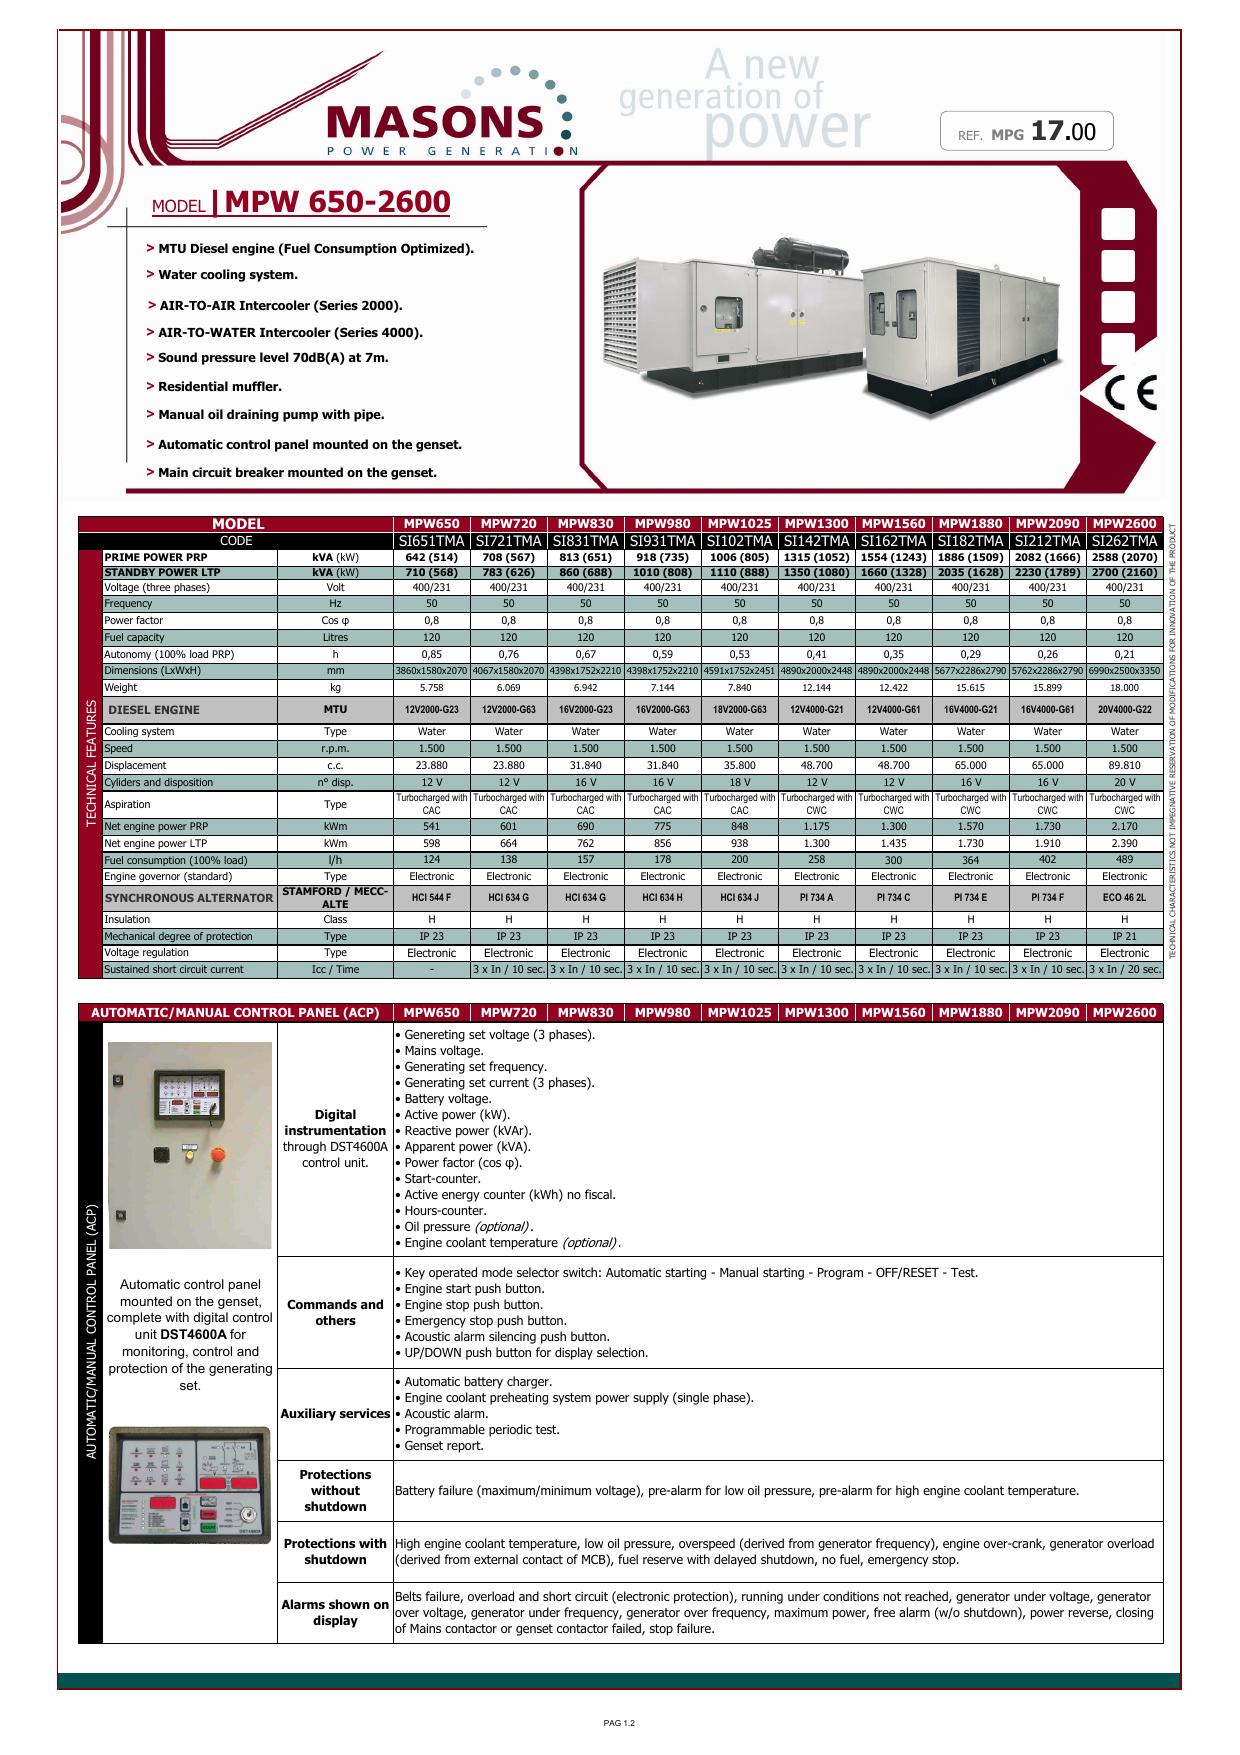 17_MPW650-2600 (MTU) Soundproof | manualzz com